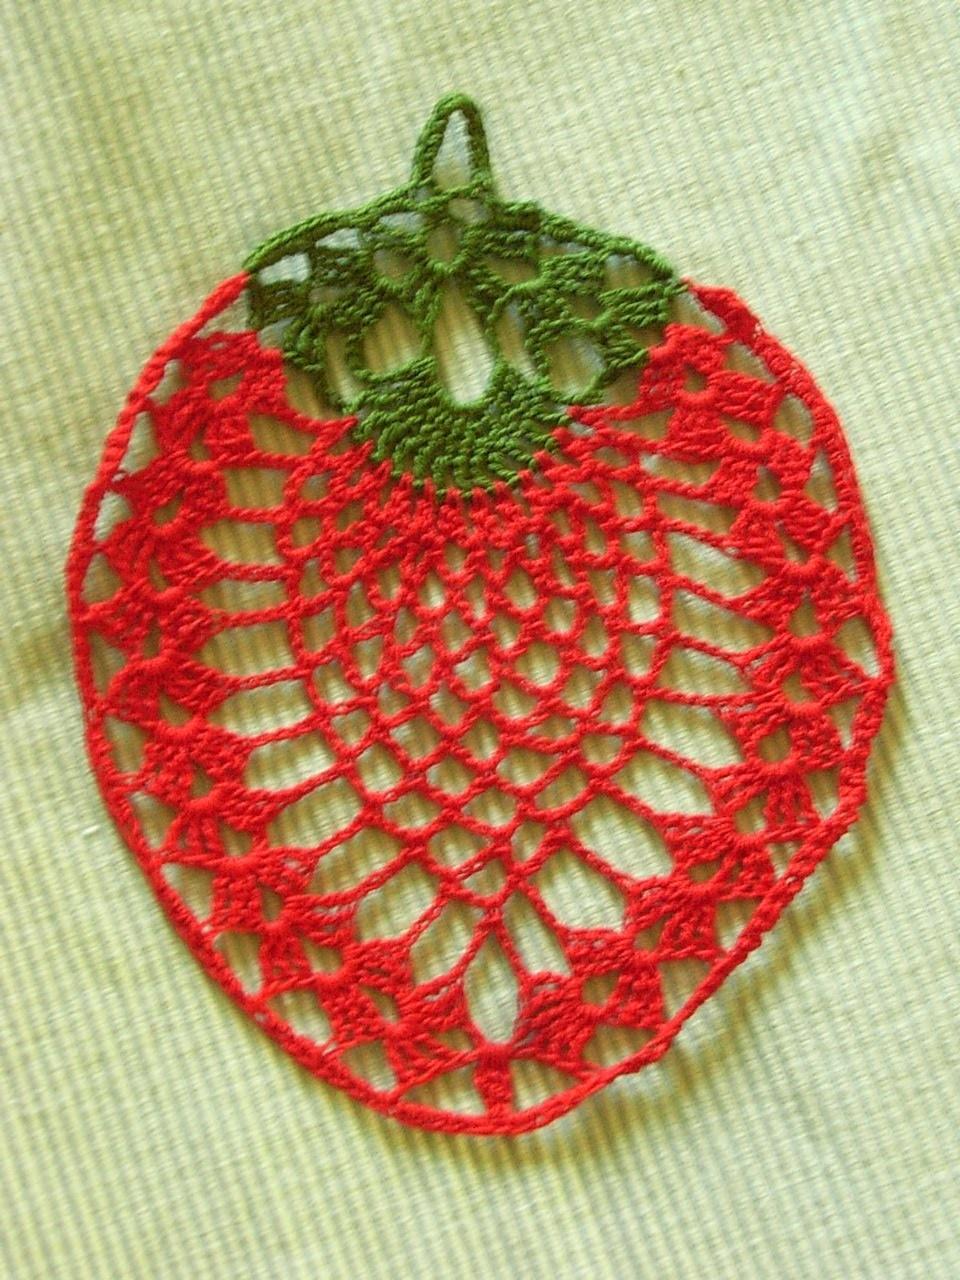 Erdbeere häkeln strawberry crochet*Tablecloth crochet*Teil 2*Tutorial Handarbeit